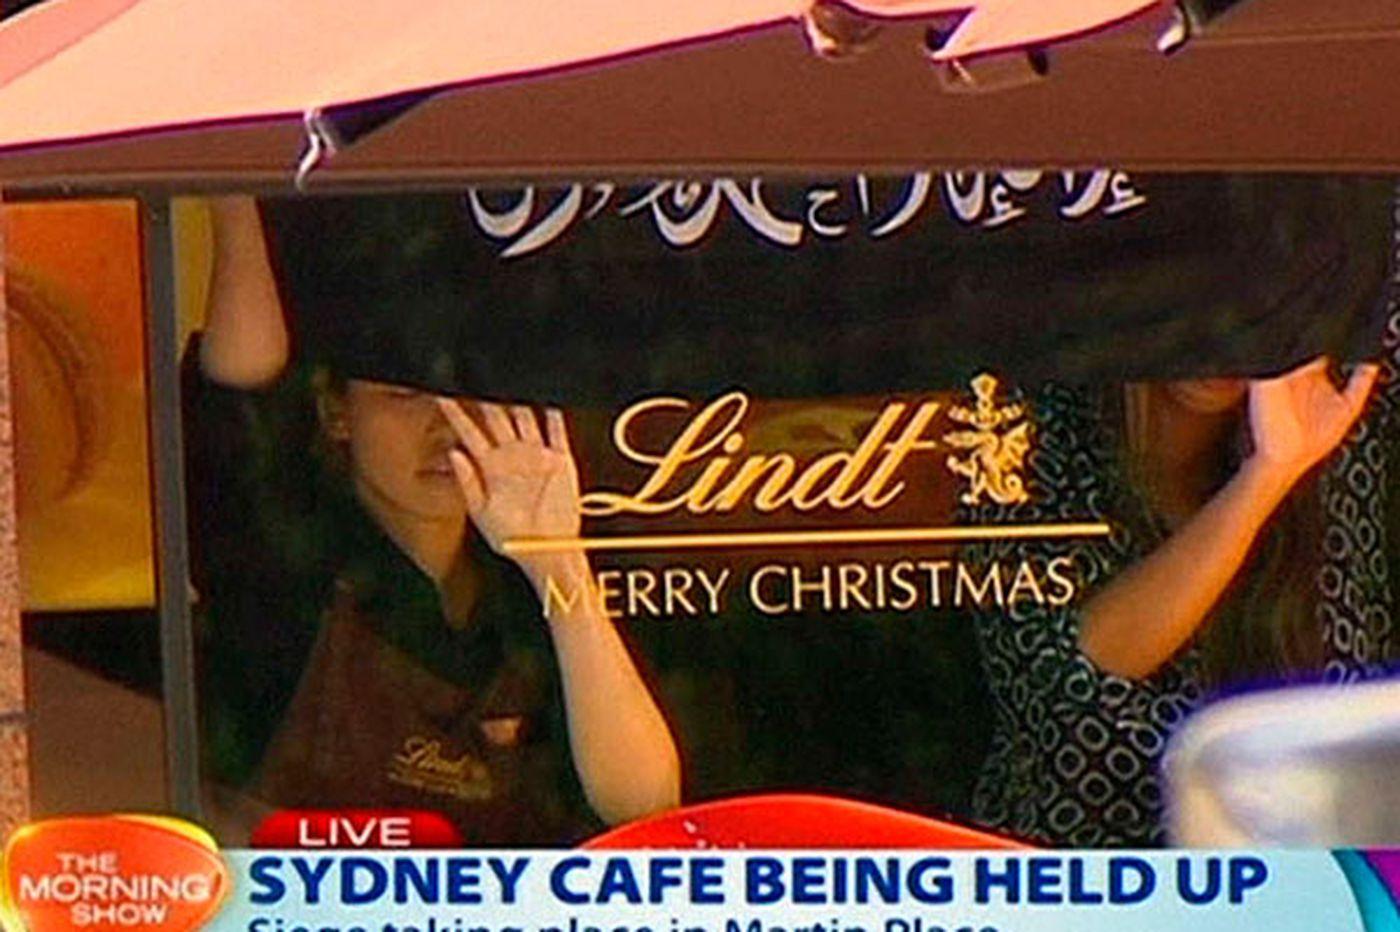 In Sydney, a social media siege